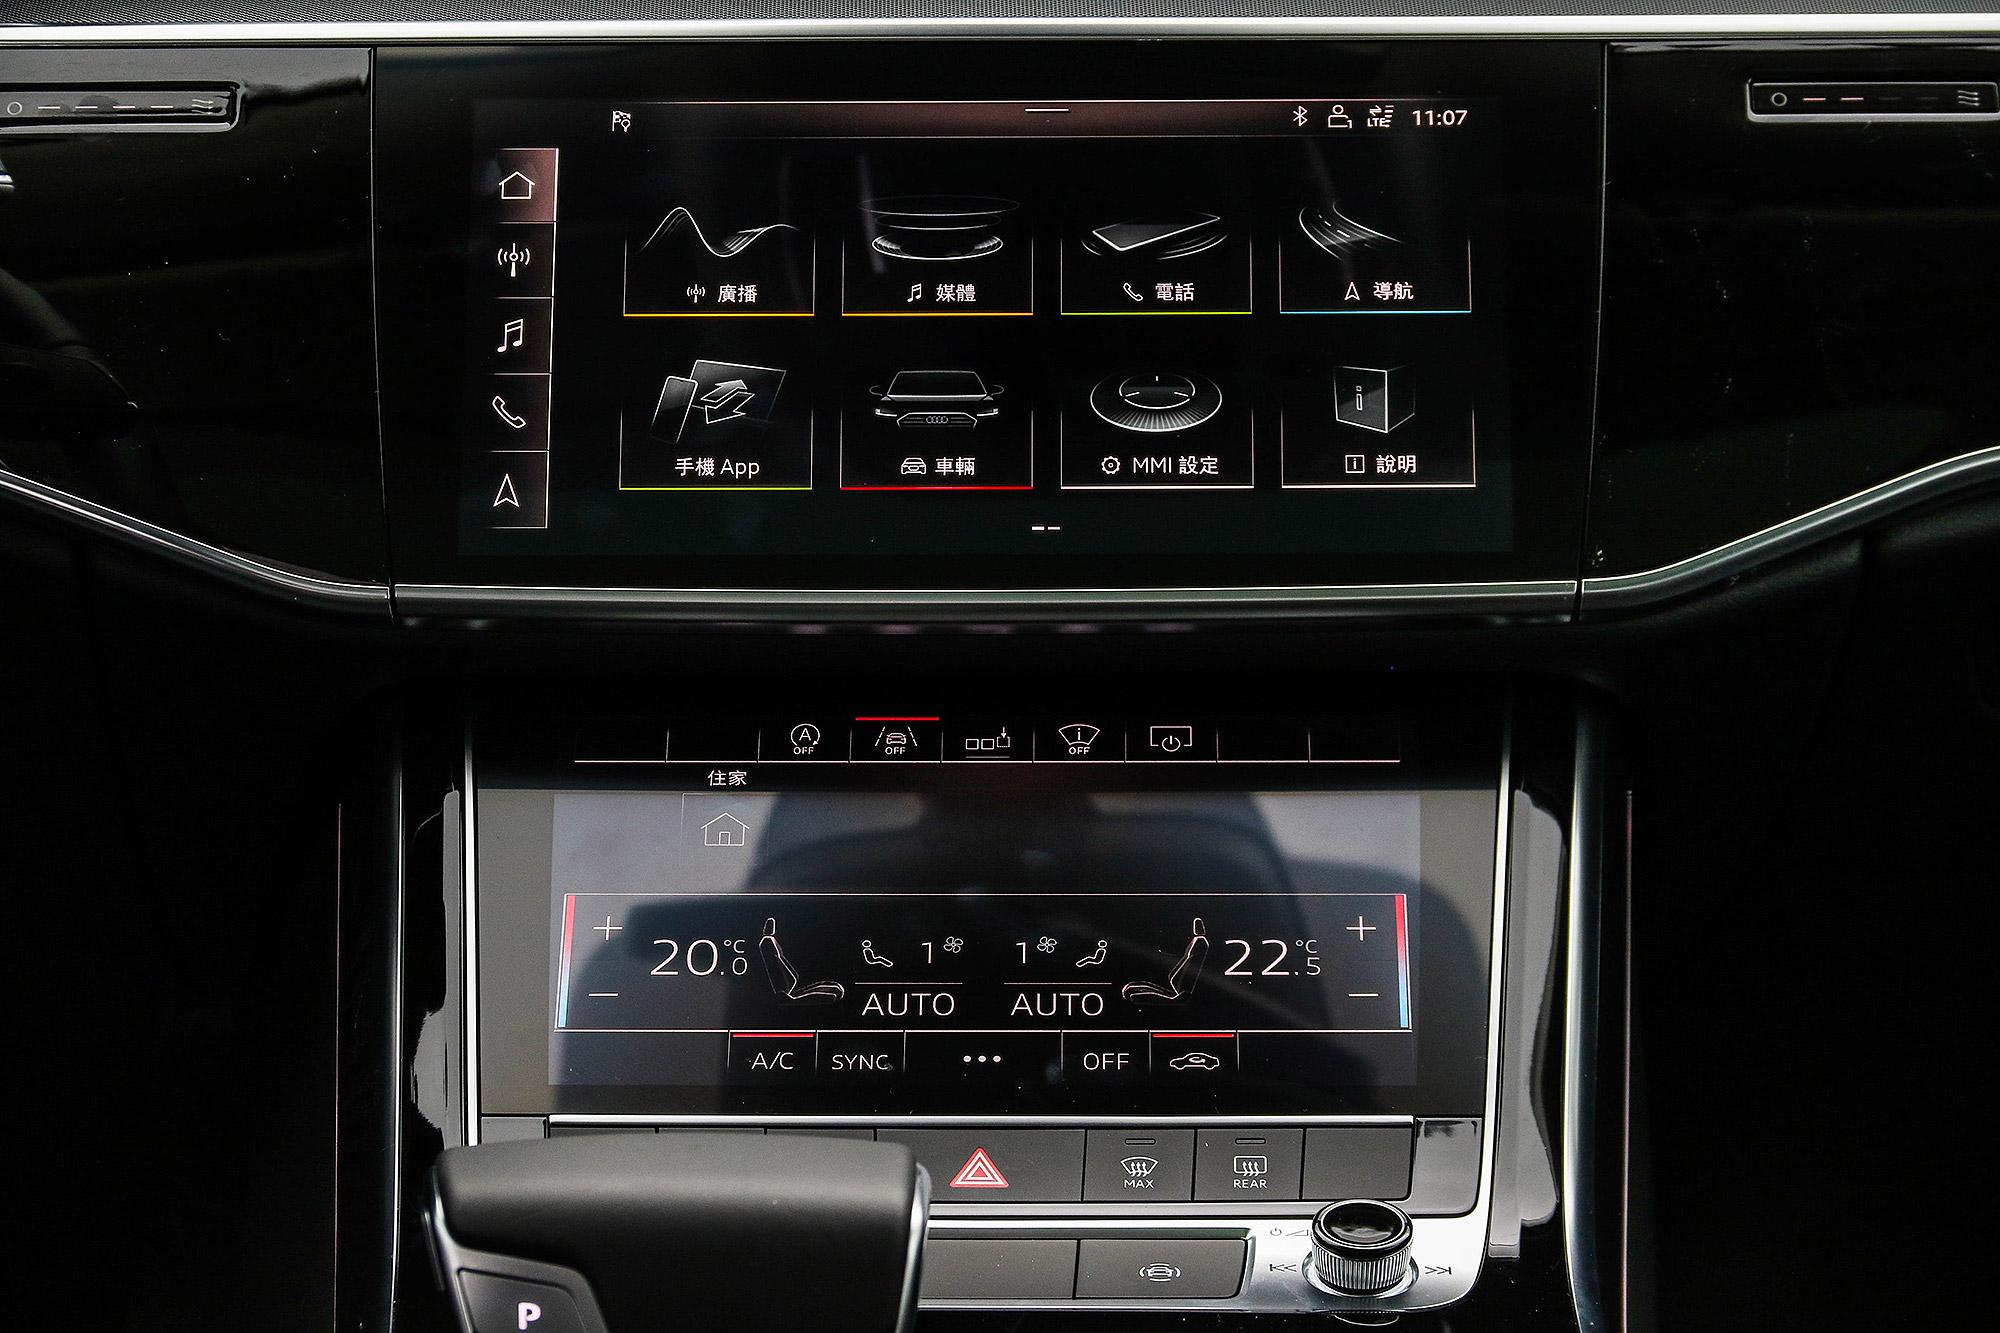 MMI Touch Response 系統由 10.1 吋與 8.6 吋兩組螢幕組成。